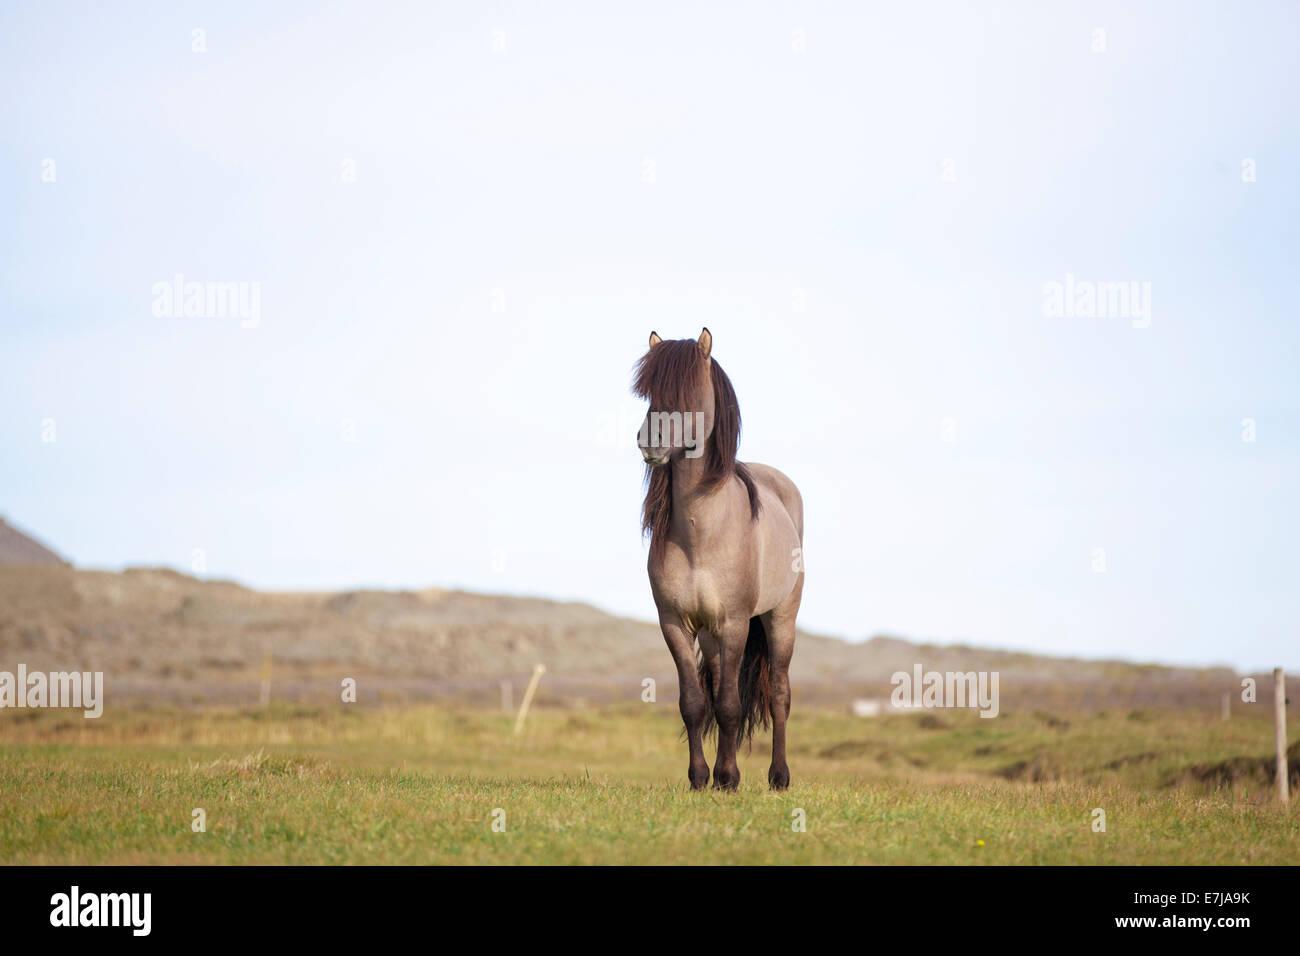 Icelandic Horse, stallion, grullo or blue dun, on a green meadow, Höfn í Hornafirði, Iceland - Stock Image